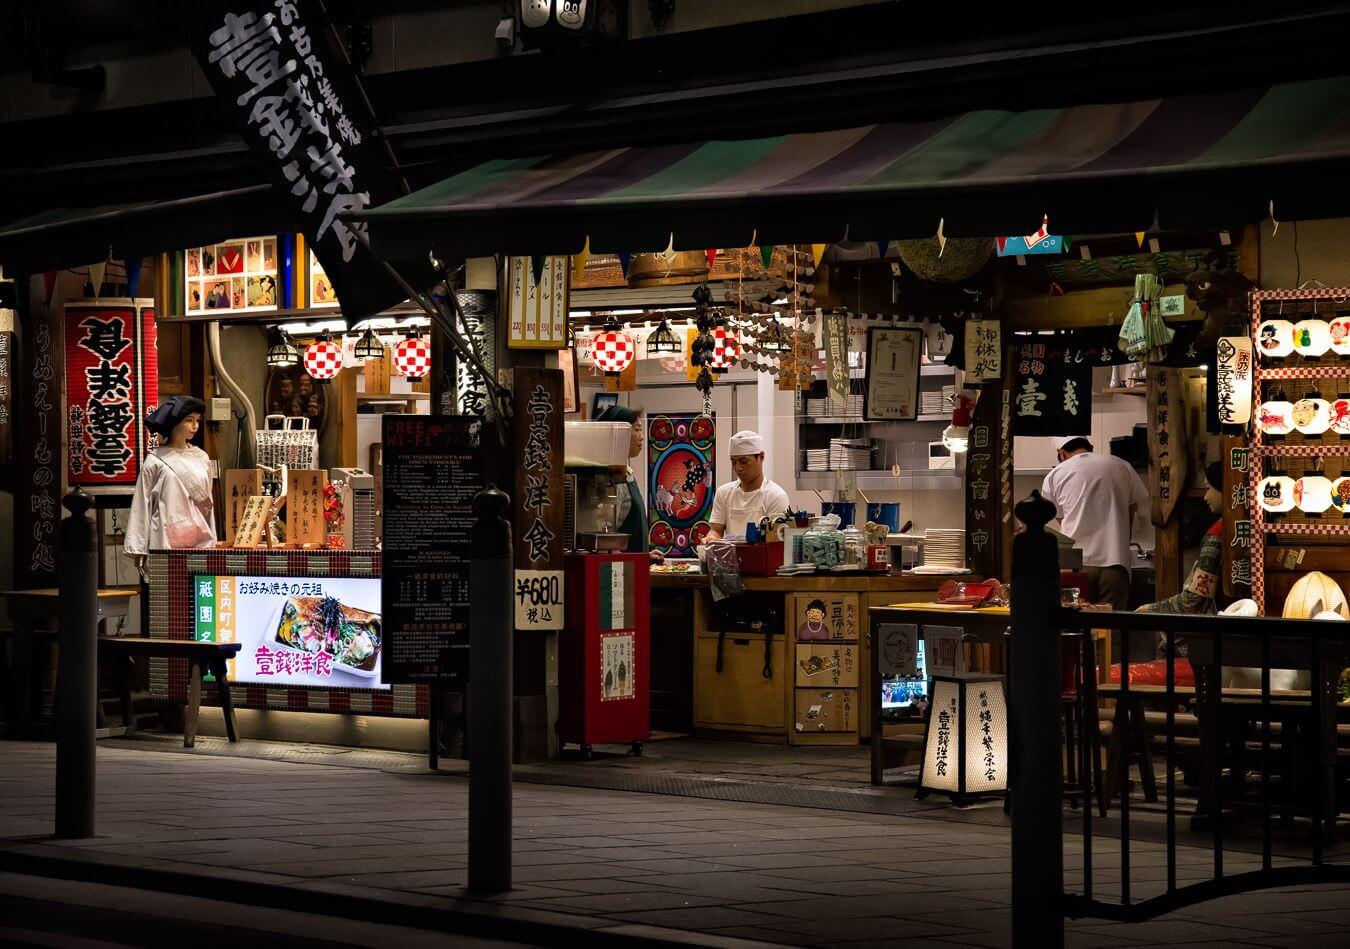 Street at night - Tokyo, Japan - Photo by Zdenek Sindelar of CuriousZed Photography